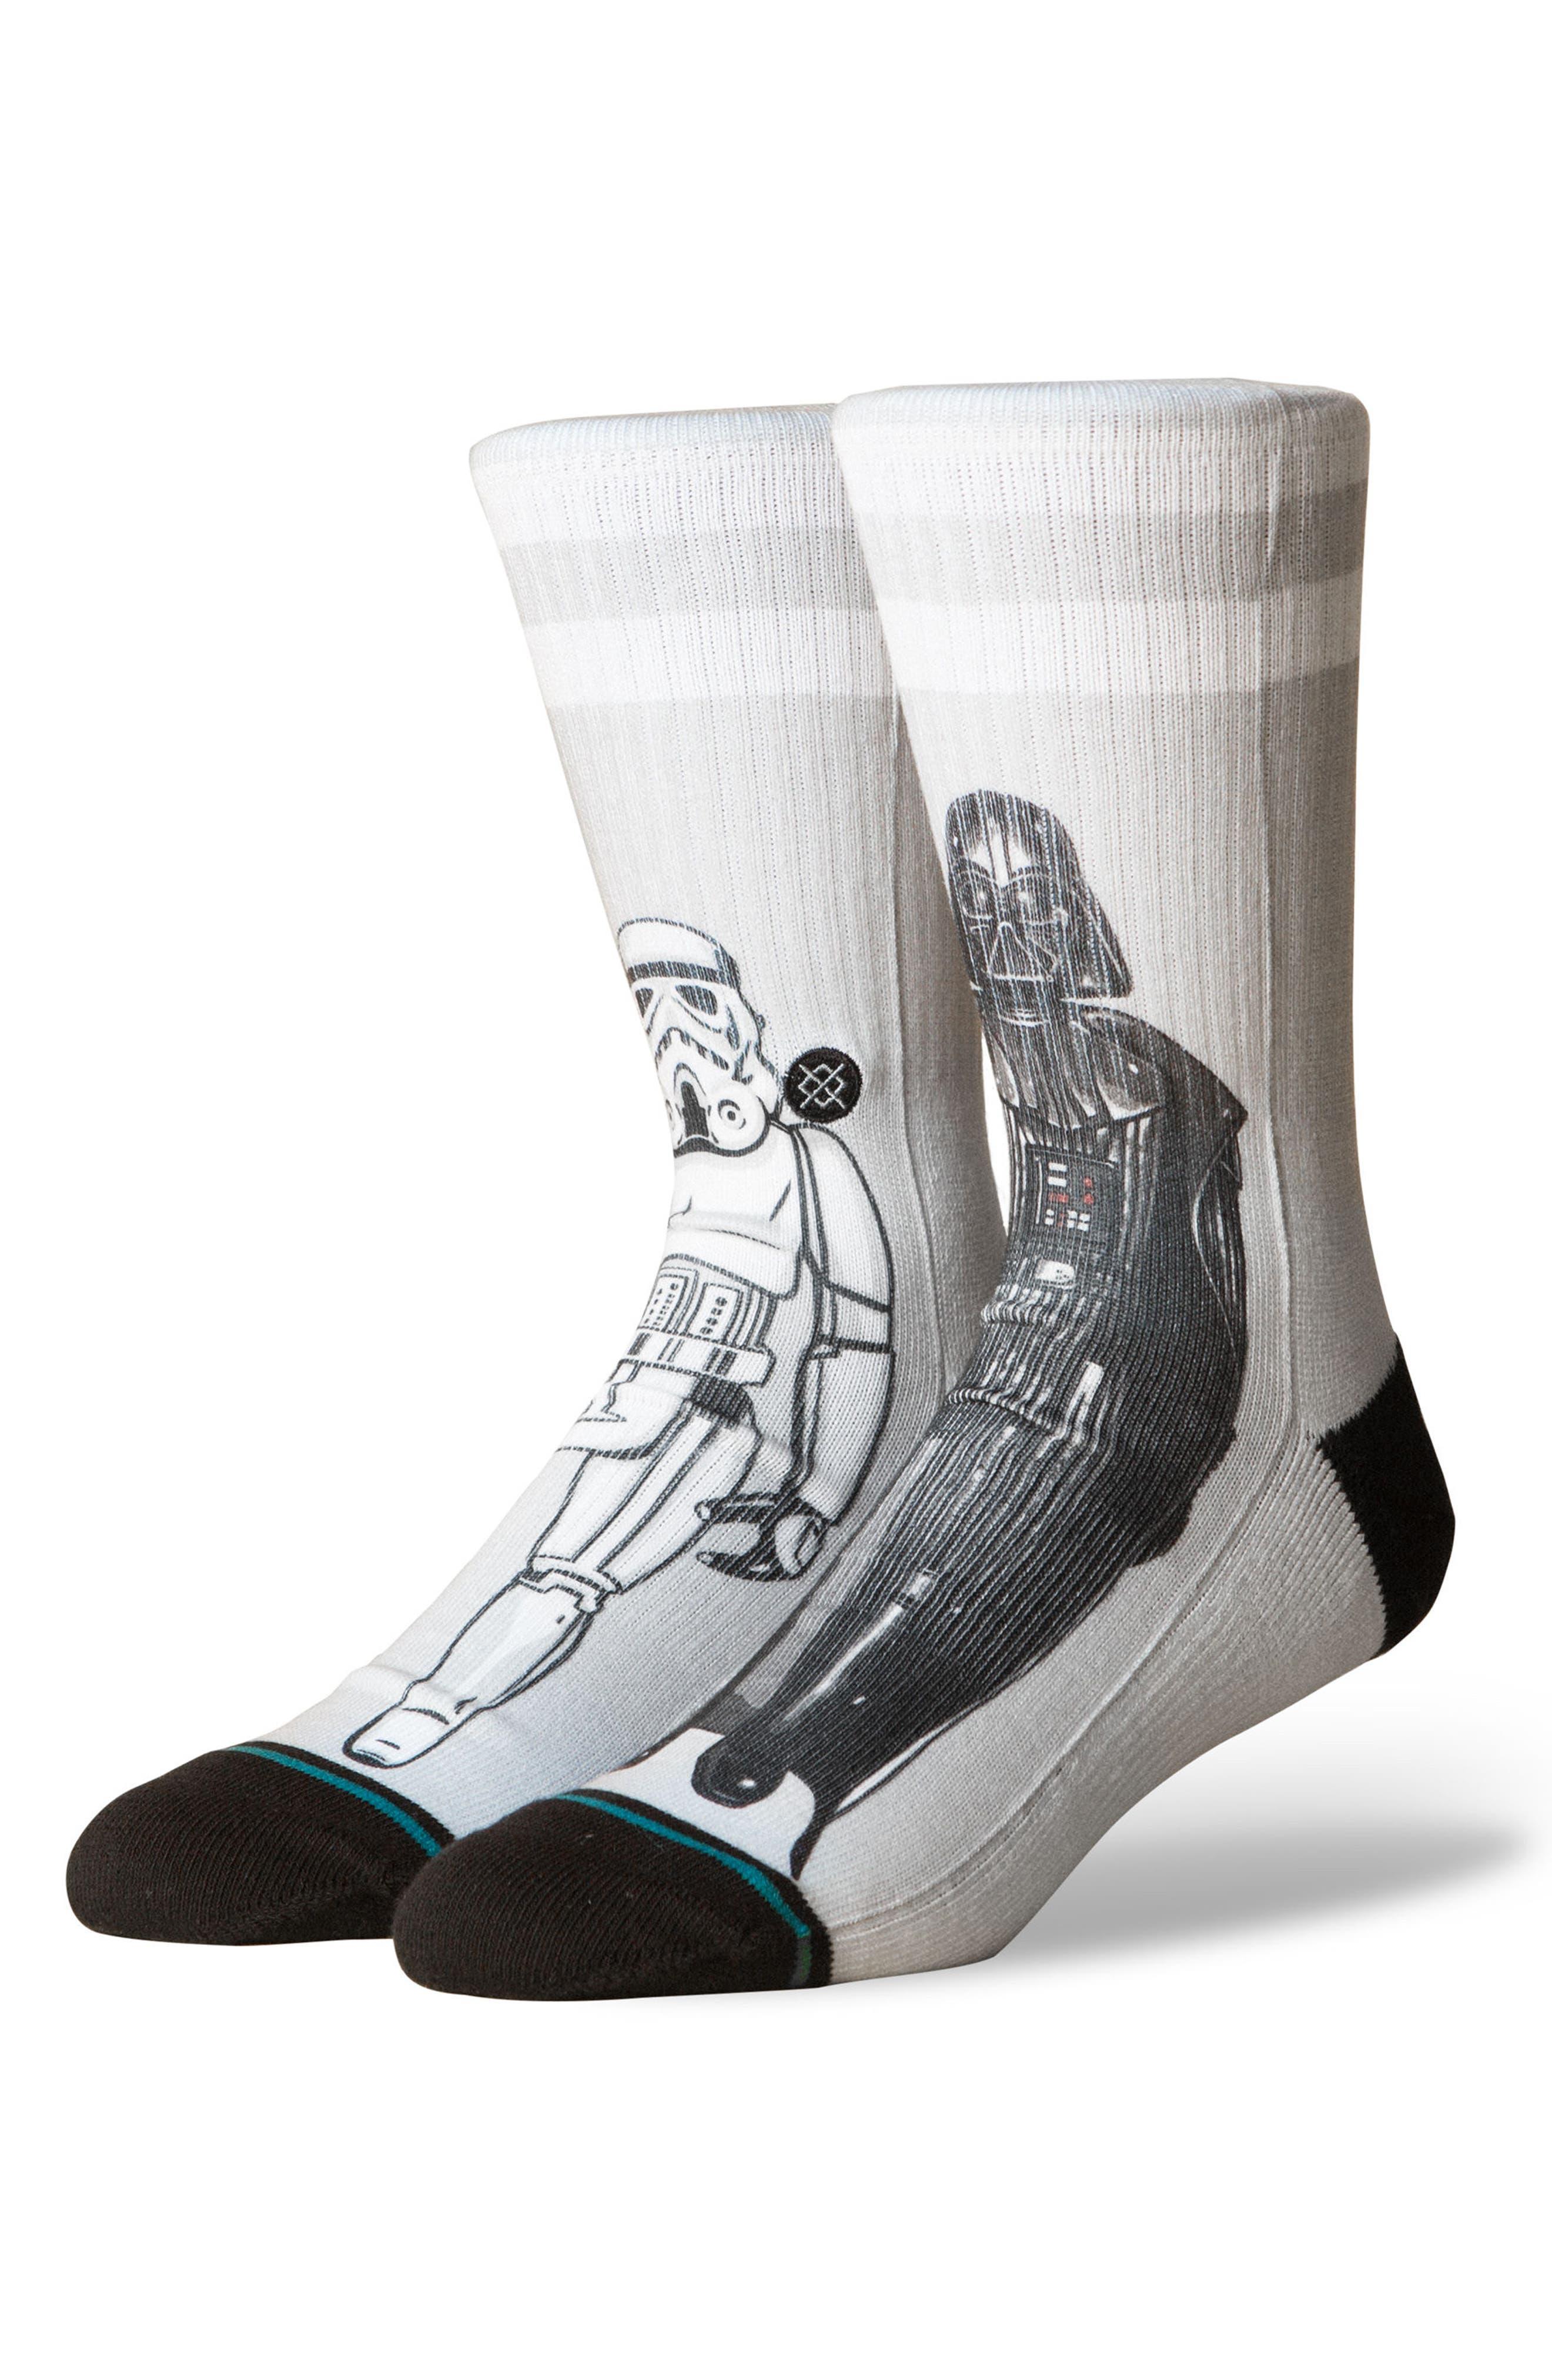 Star Wars<sup>™</sup> Master of Evil Socks,                         Main,                         color, Grey